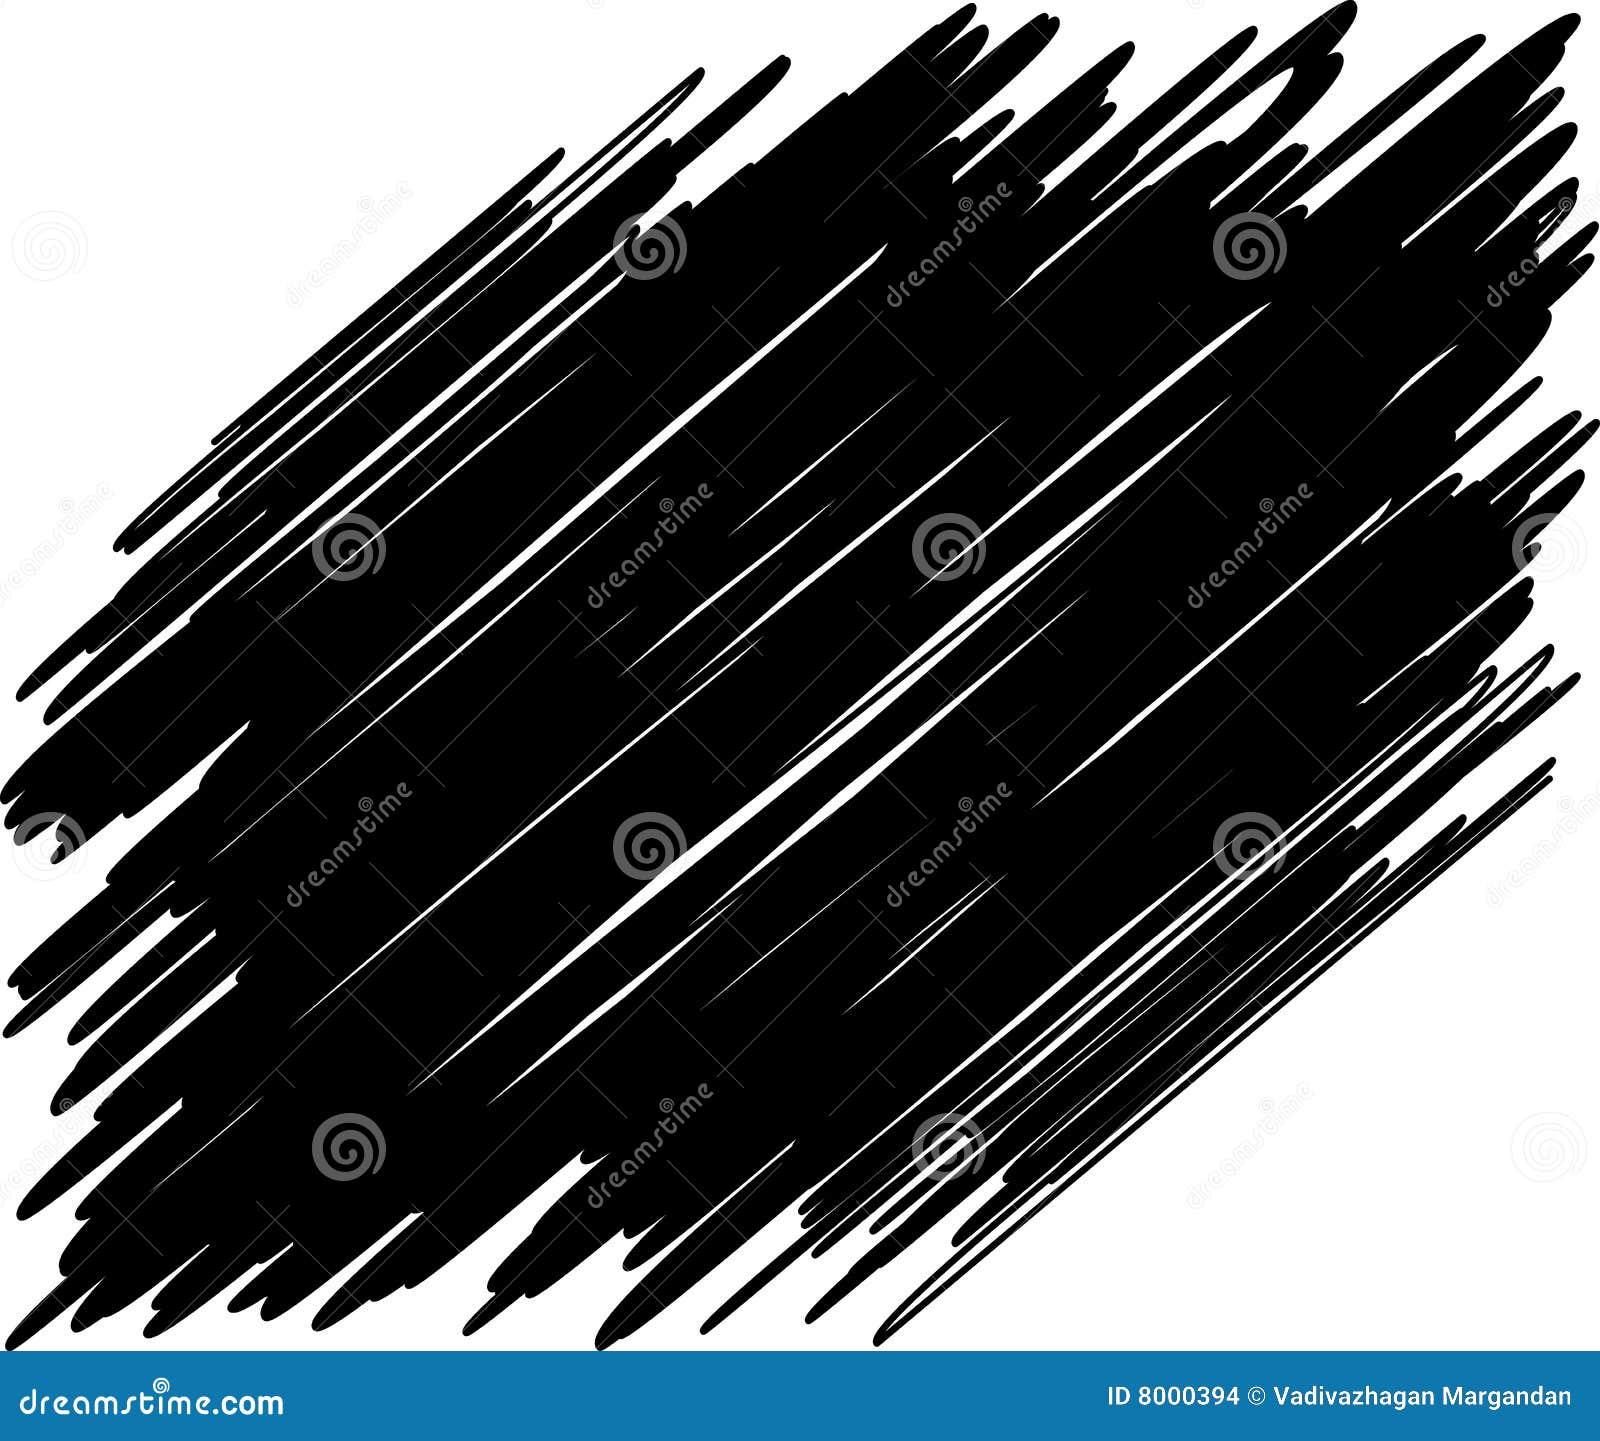 Brush Stroke Stock Images Image 8000394